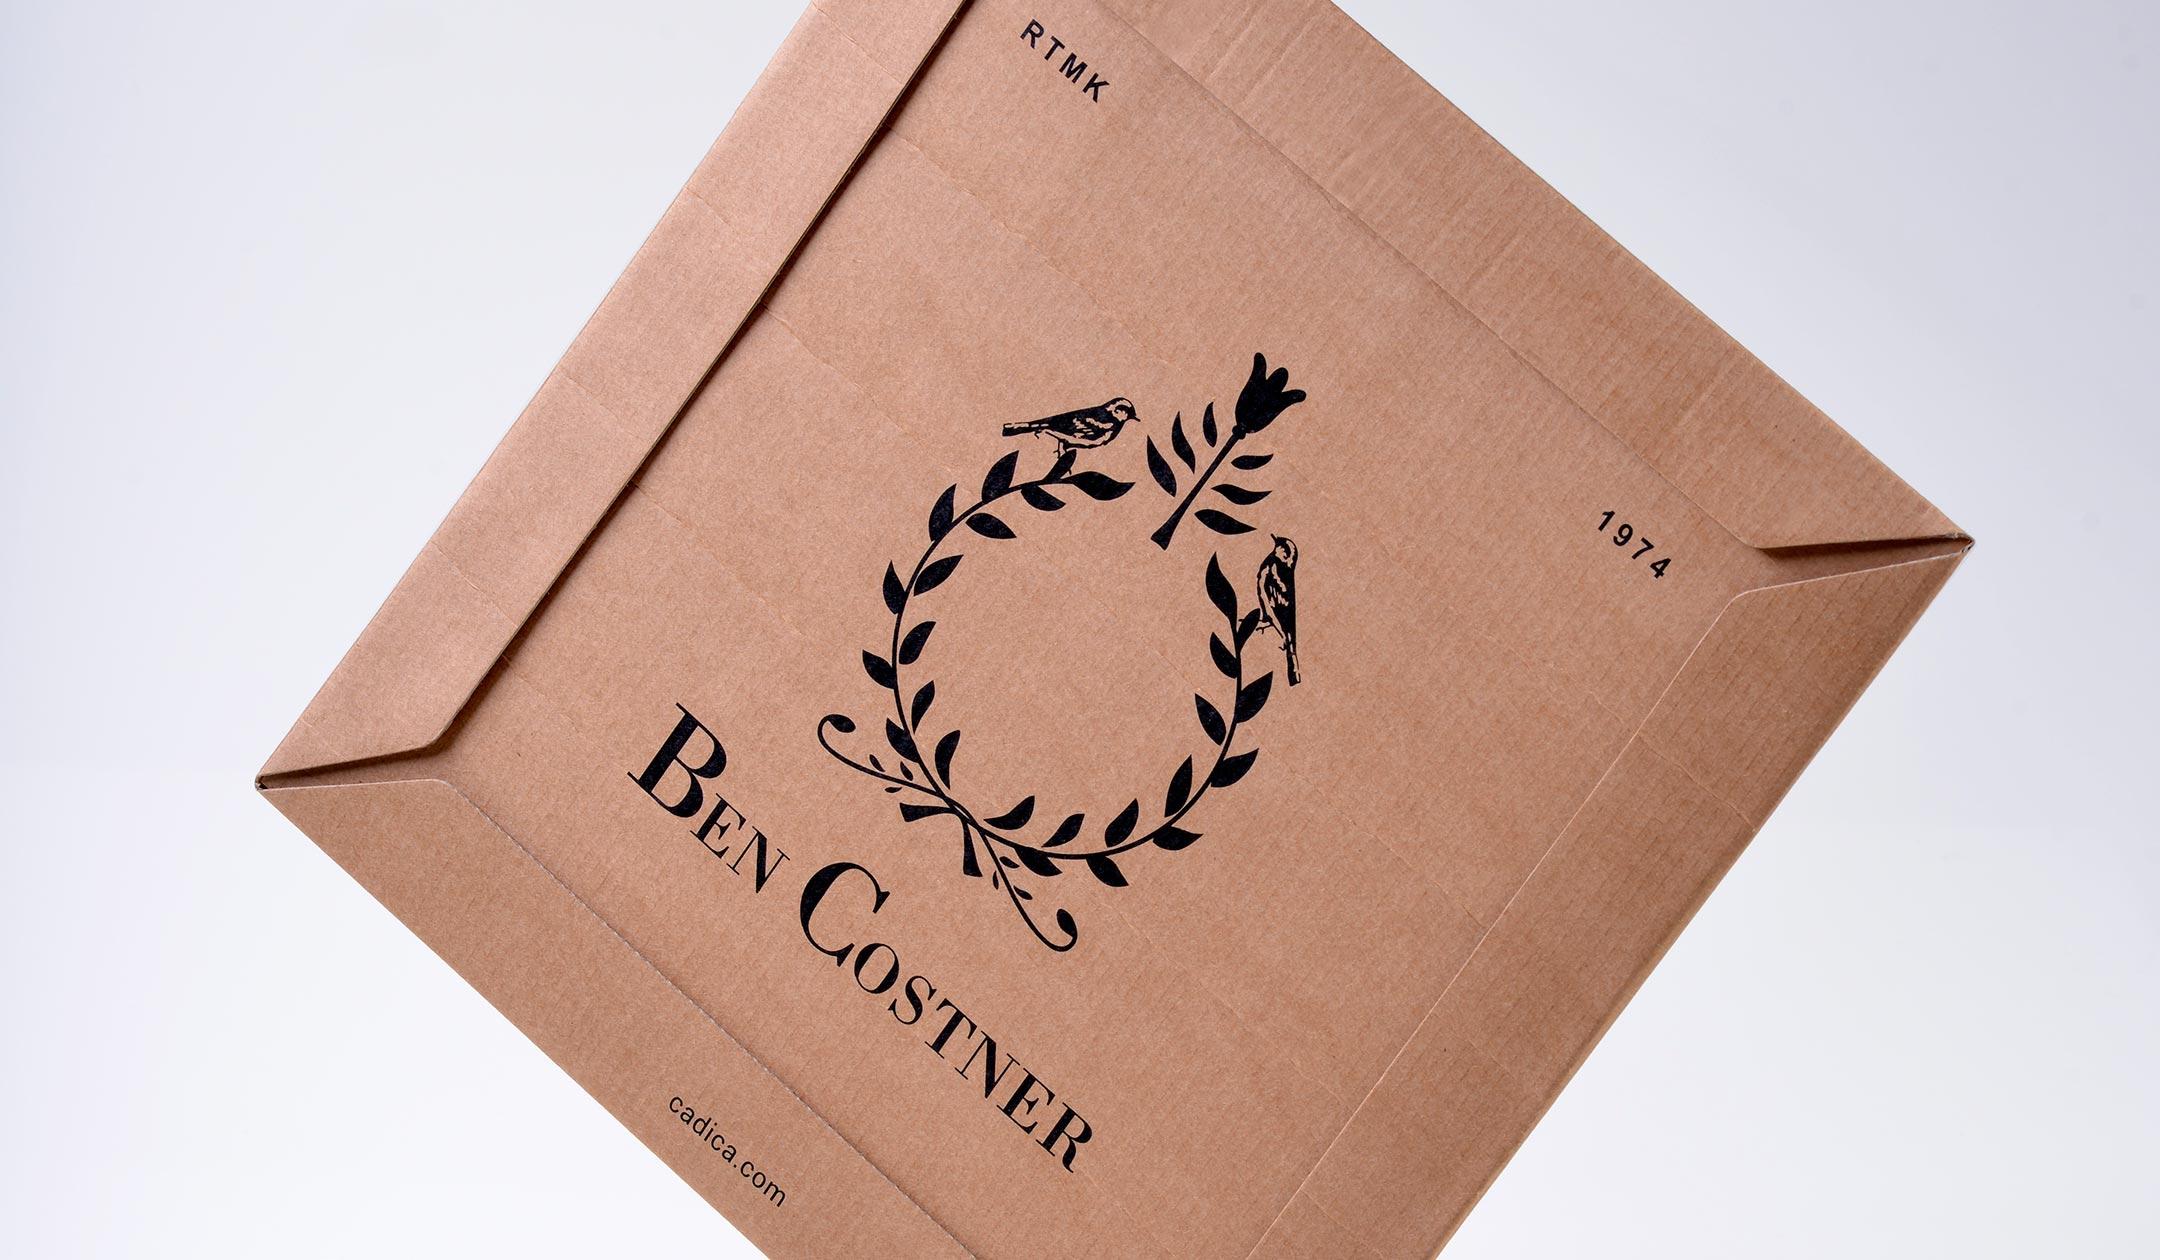 Cadica_packaging_benCostner